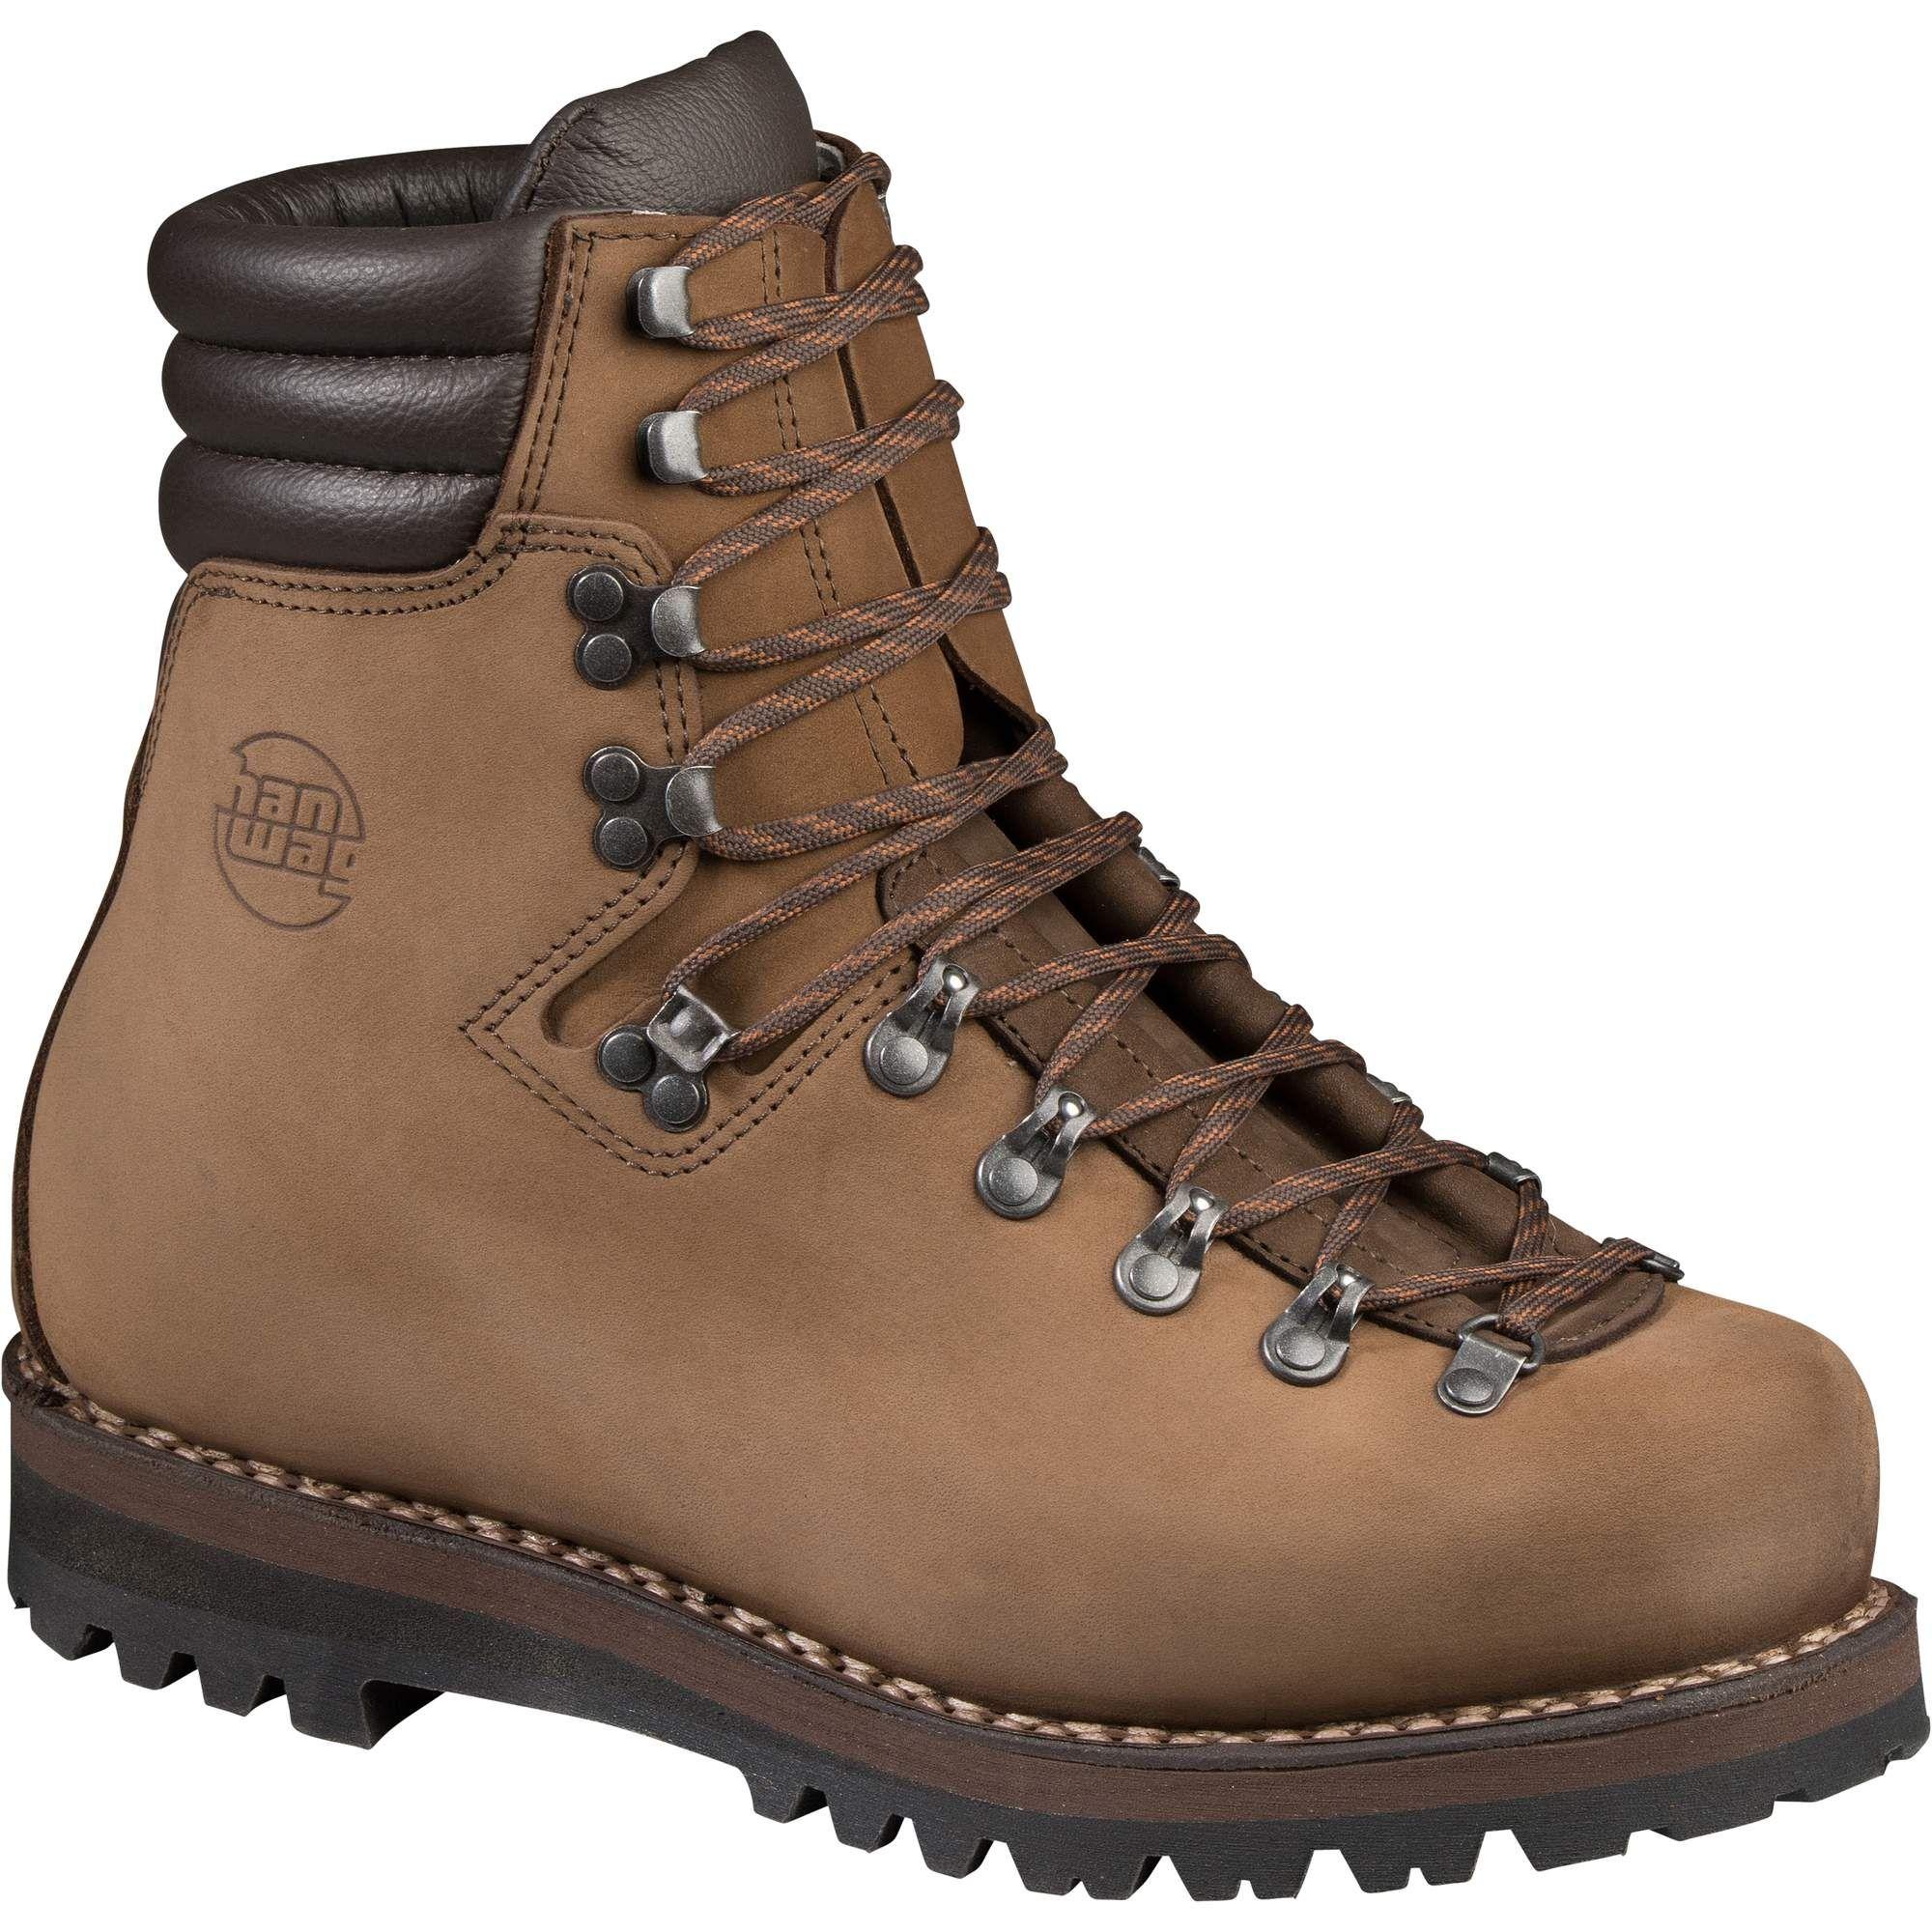 mens tall hiking boots